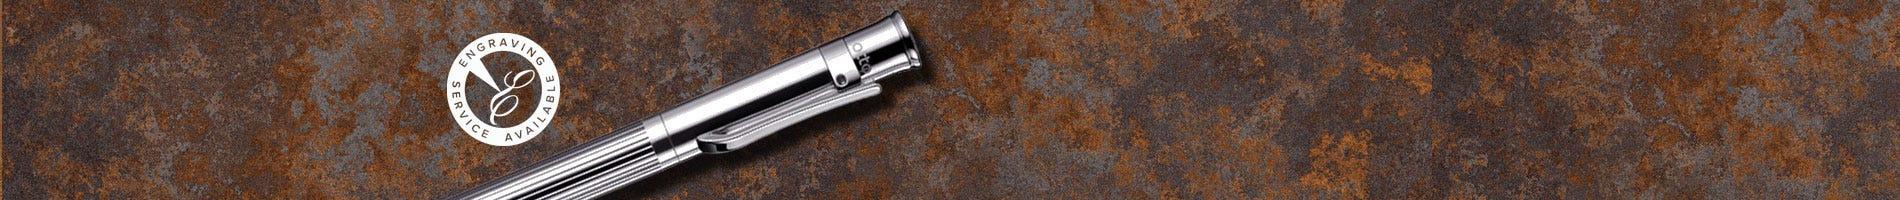 Otto Hut lined sterling silver design 04 ballpoint pen